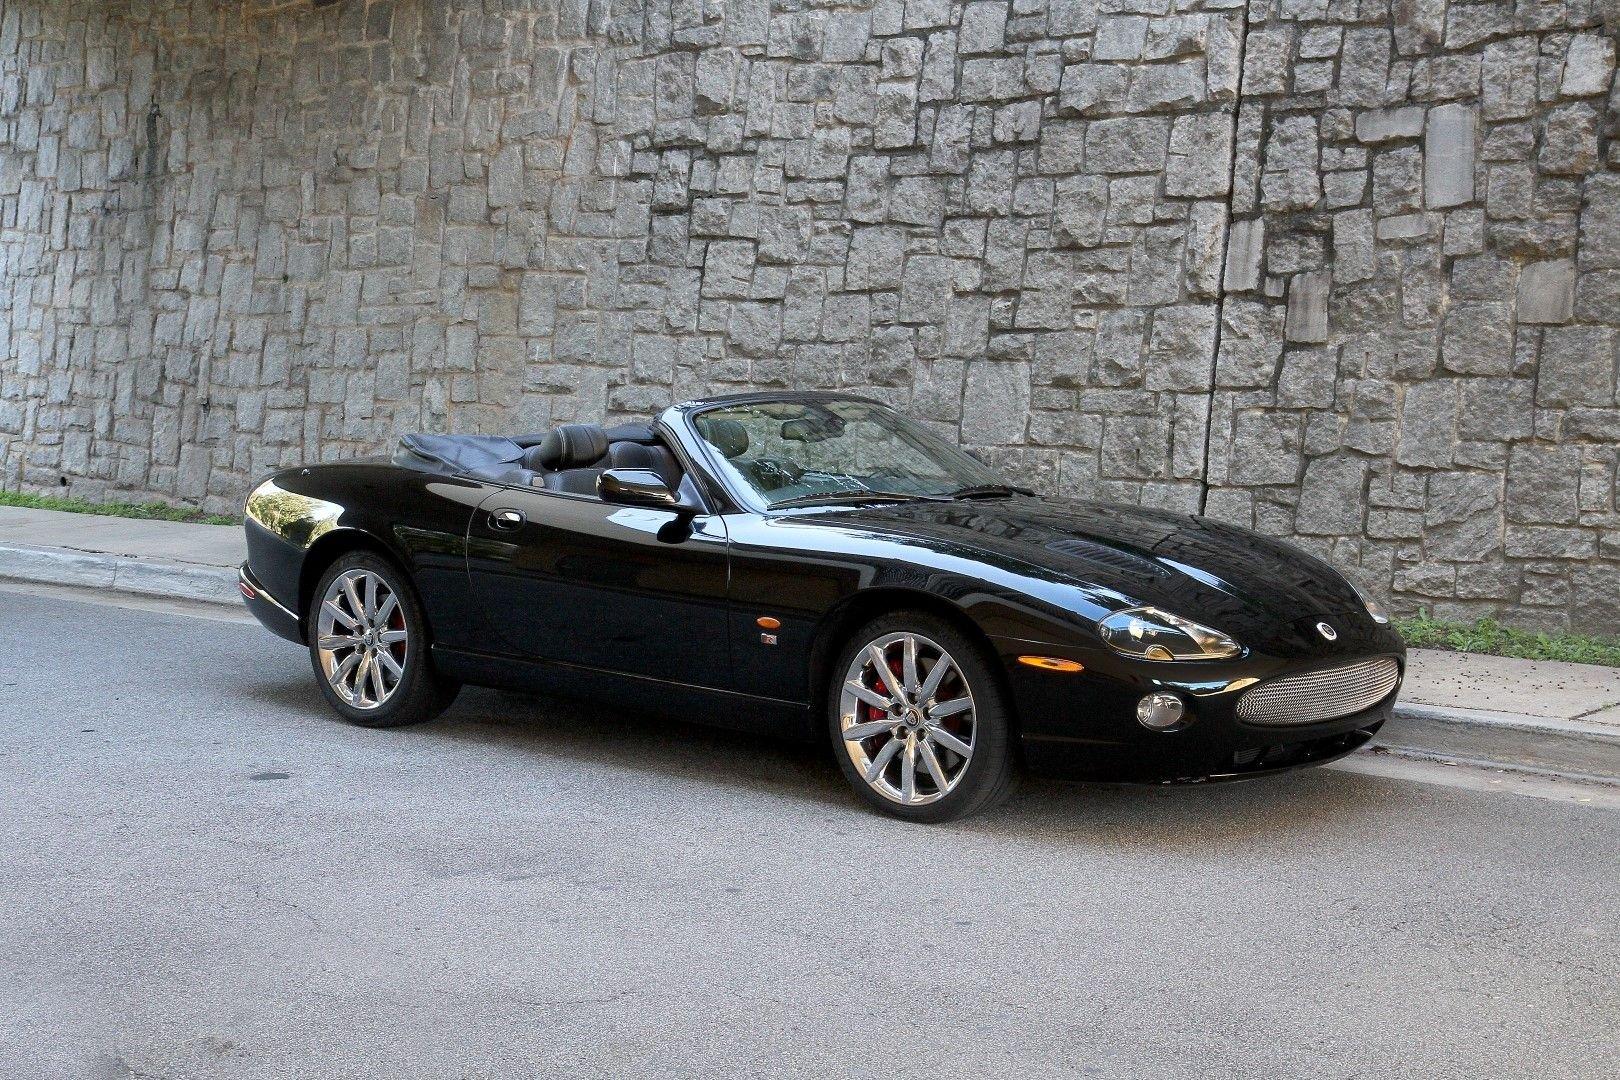 2006 jaguar xkr convertible